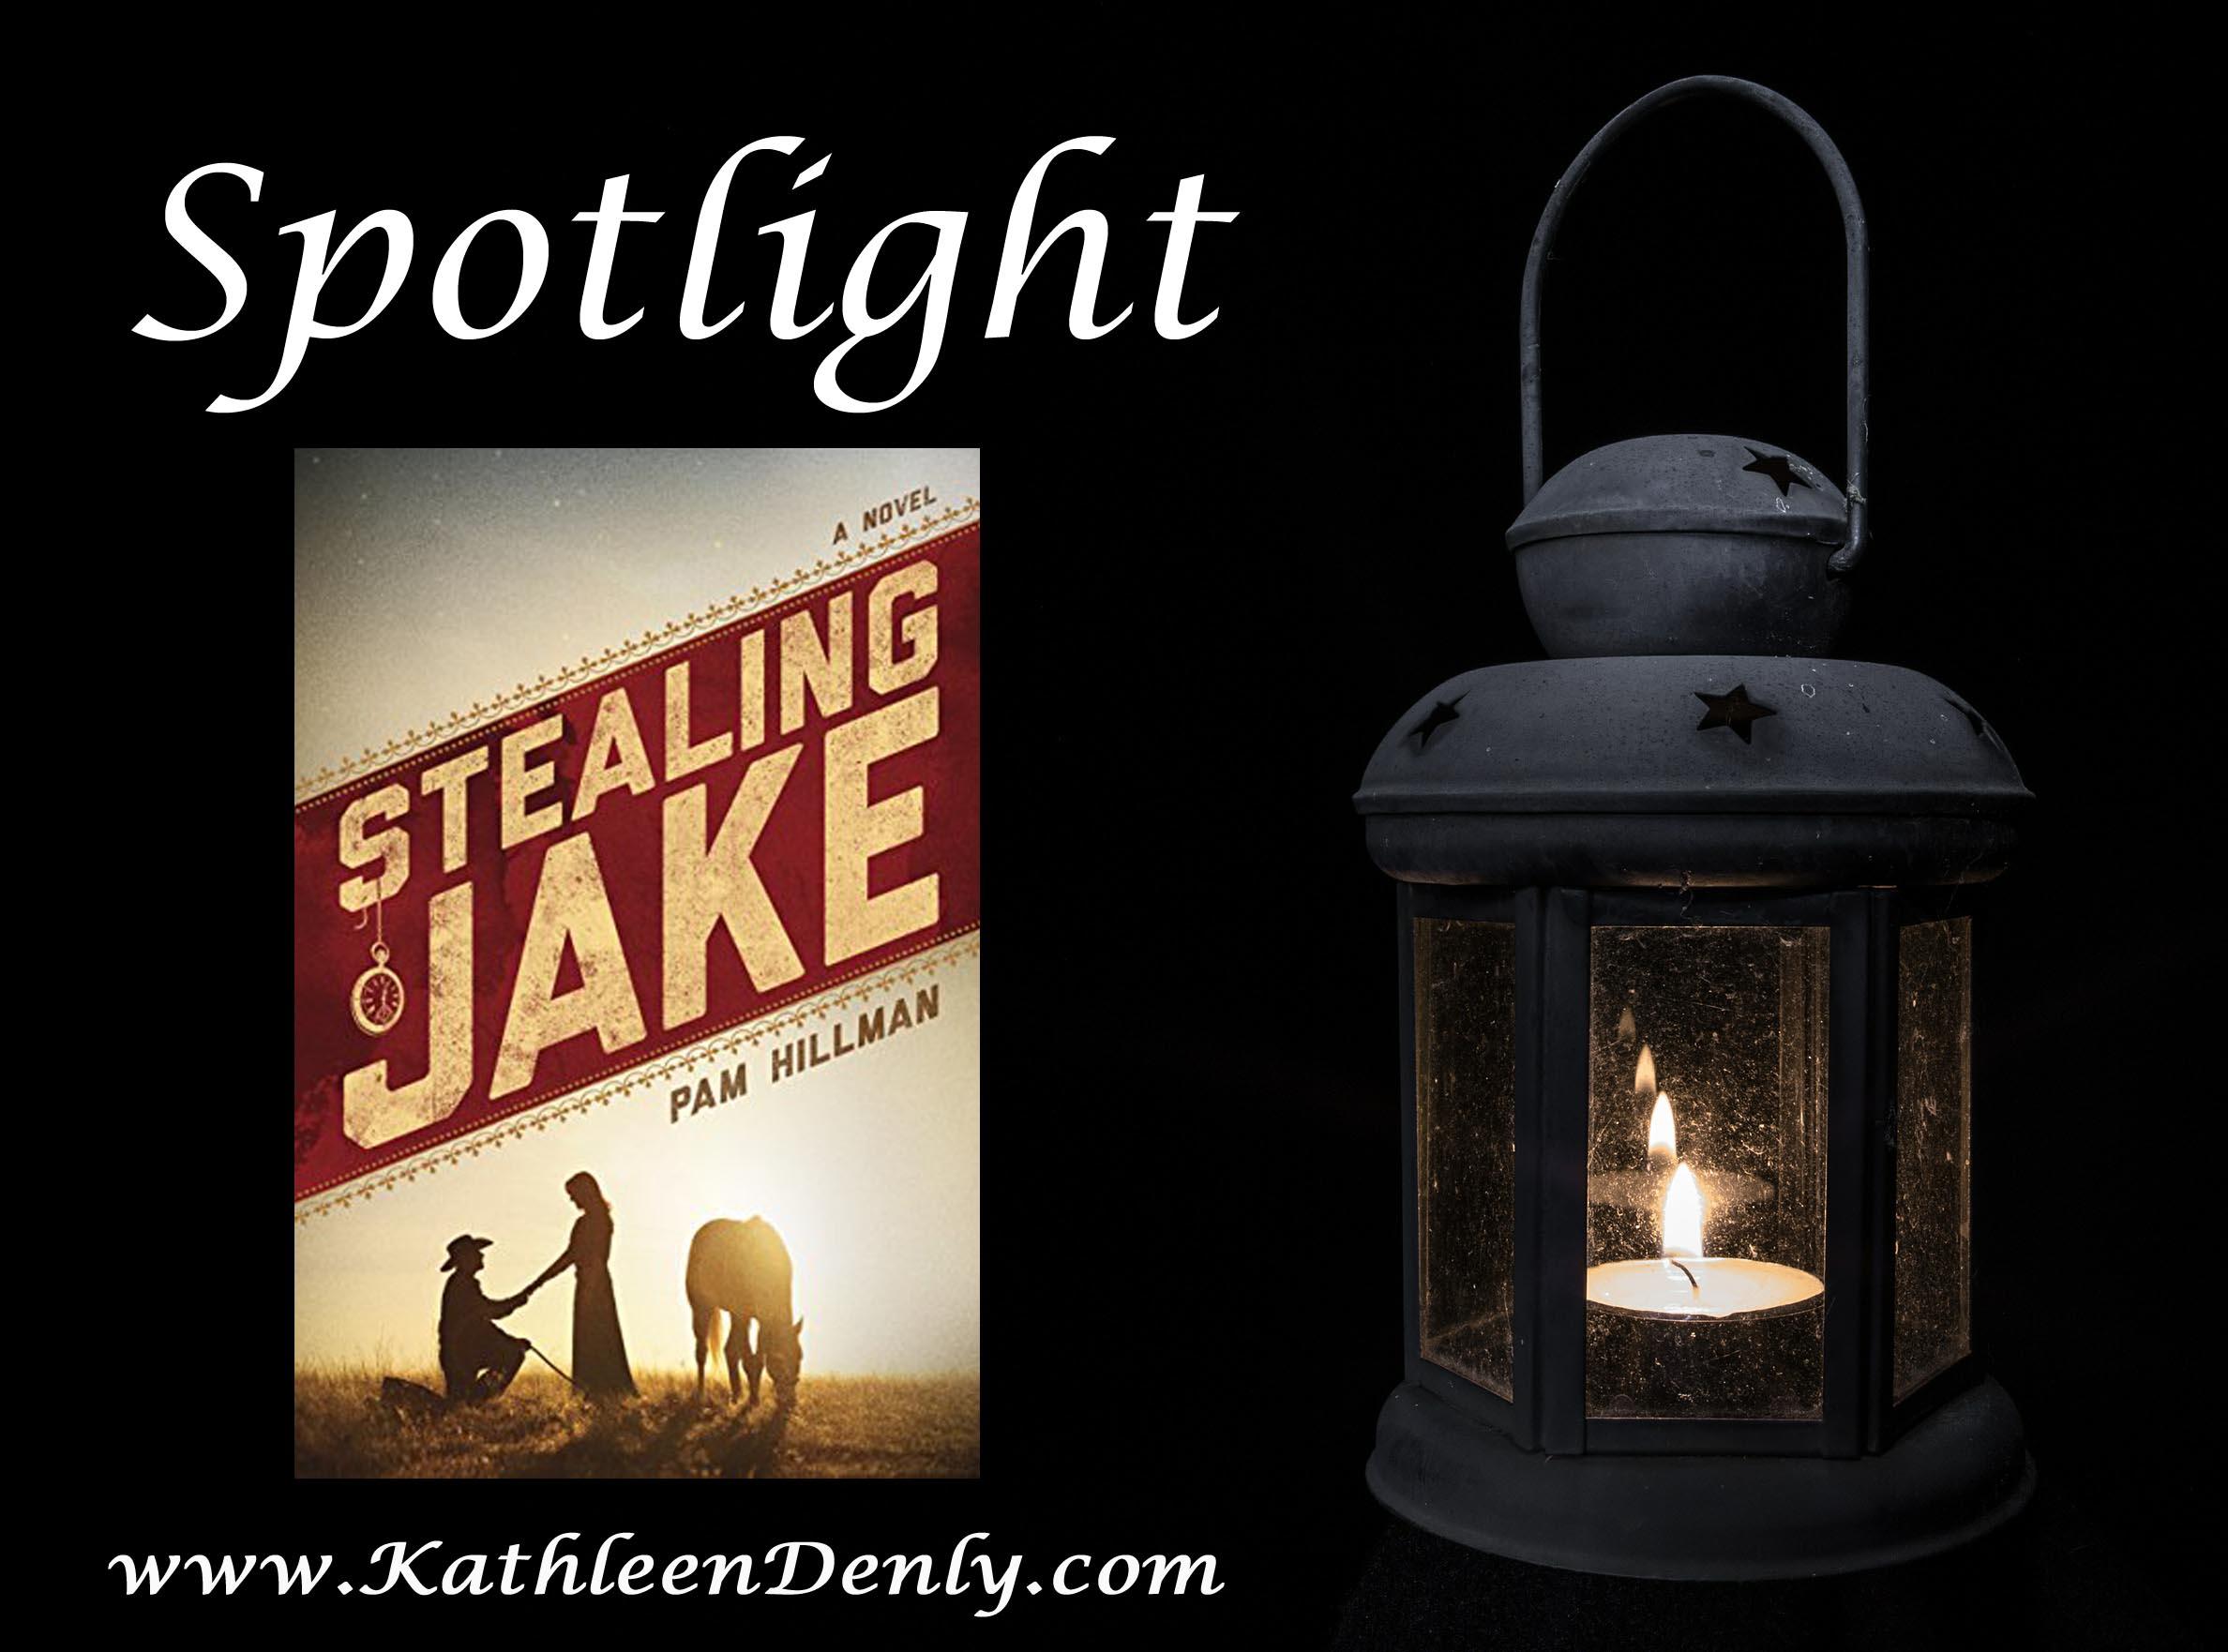 Spotlight - Stealing Jake